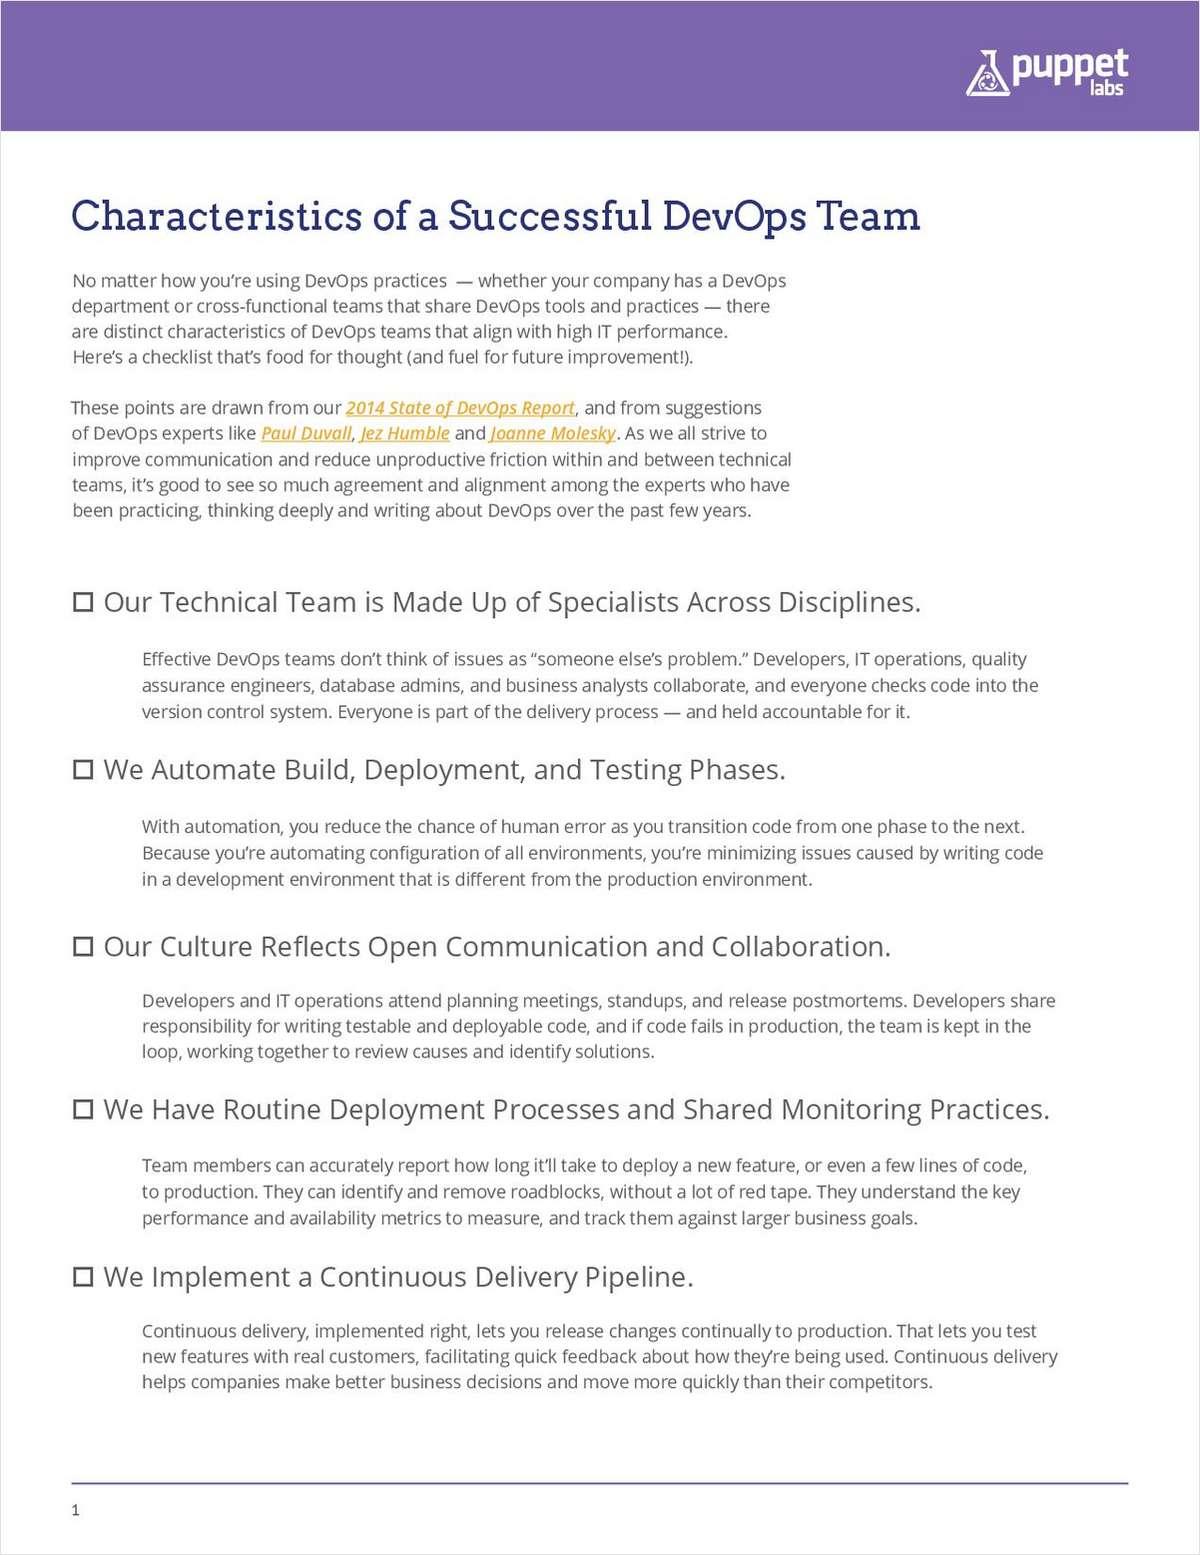 Characteristics of a Successful DevOps Team